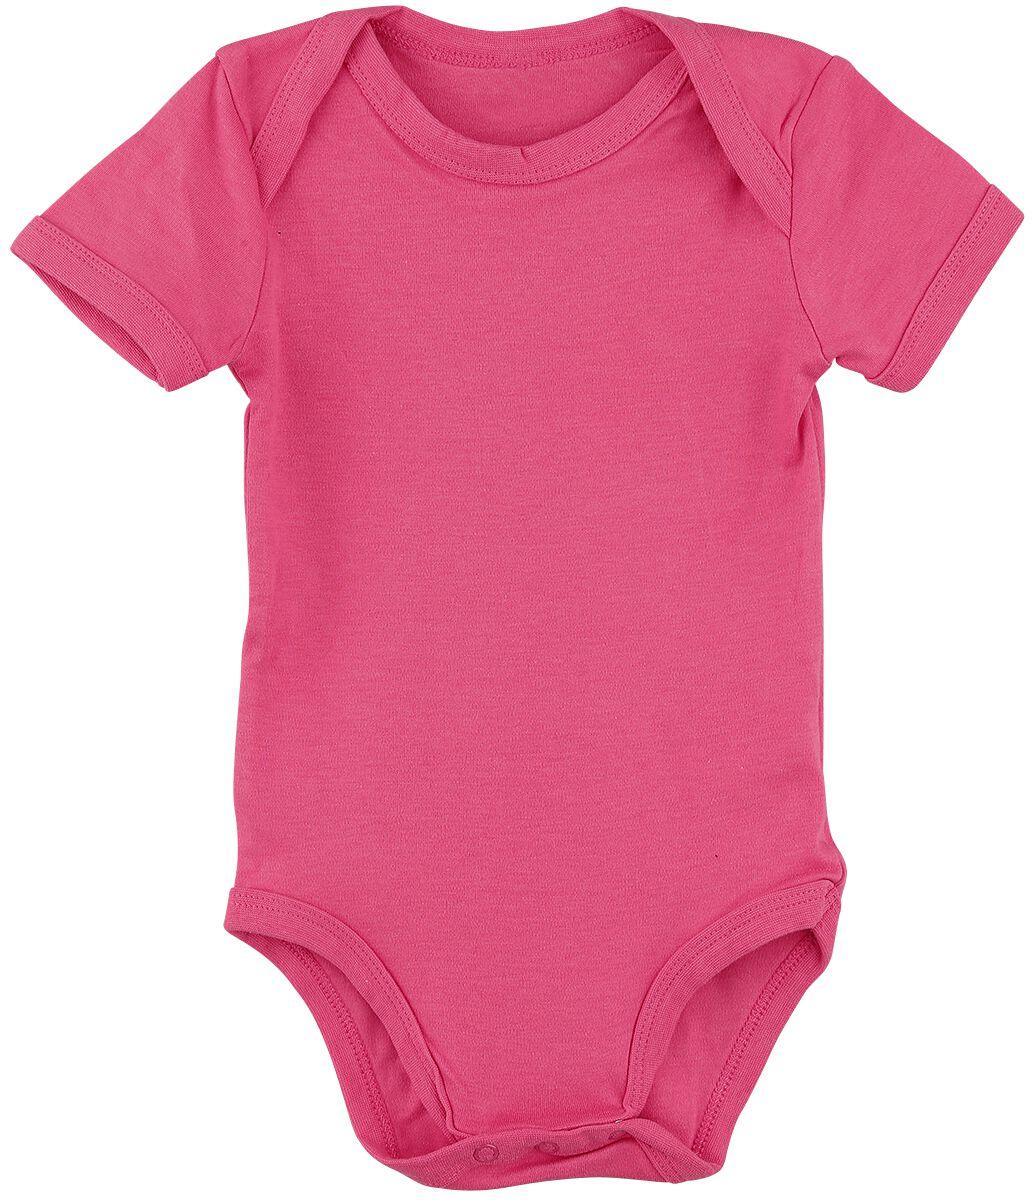 Image of Baby Bugz Bodysuit Body pink